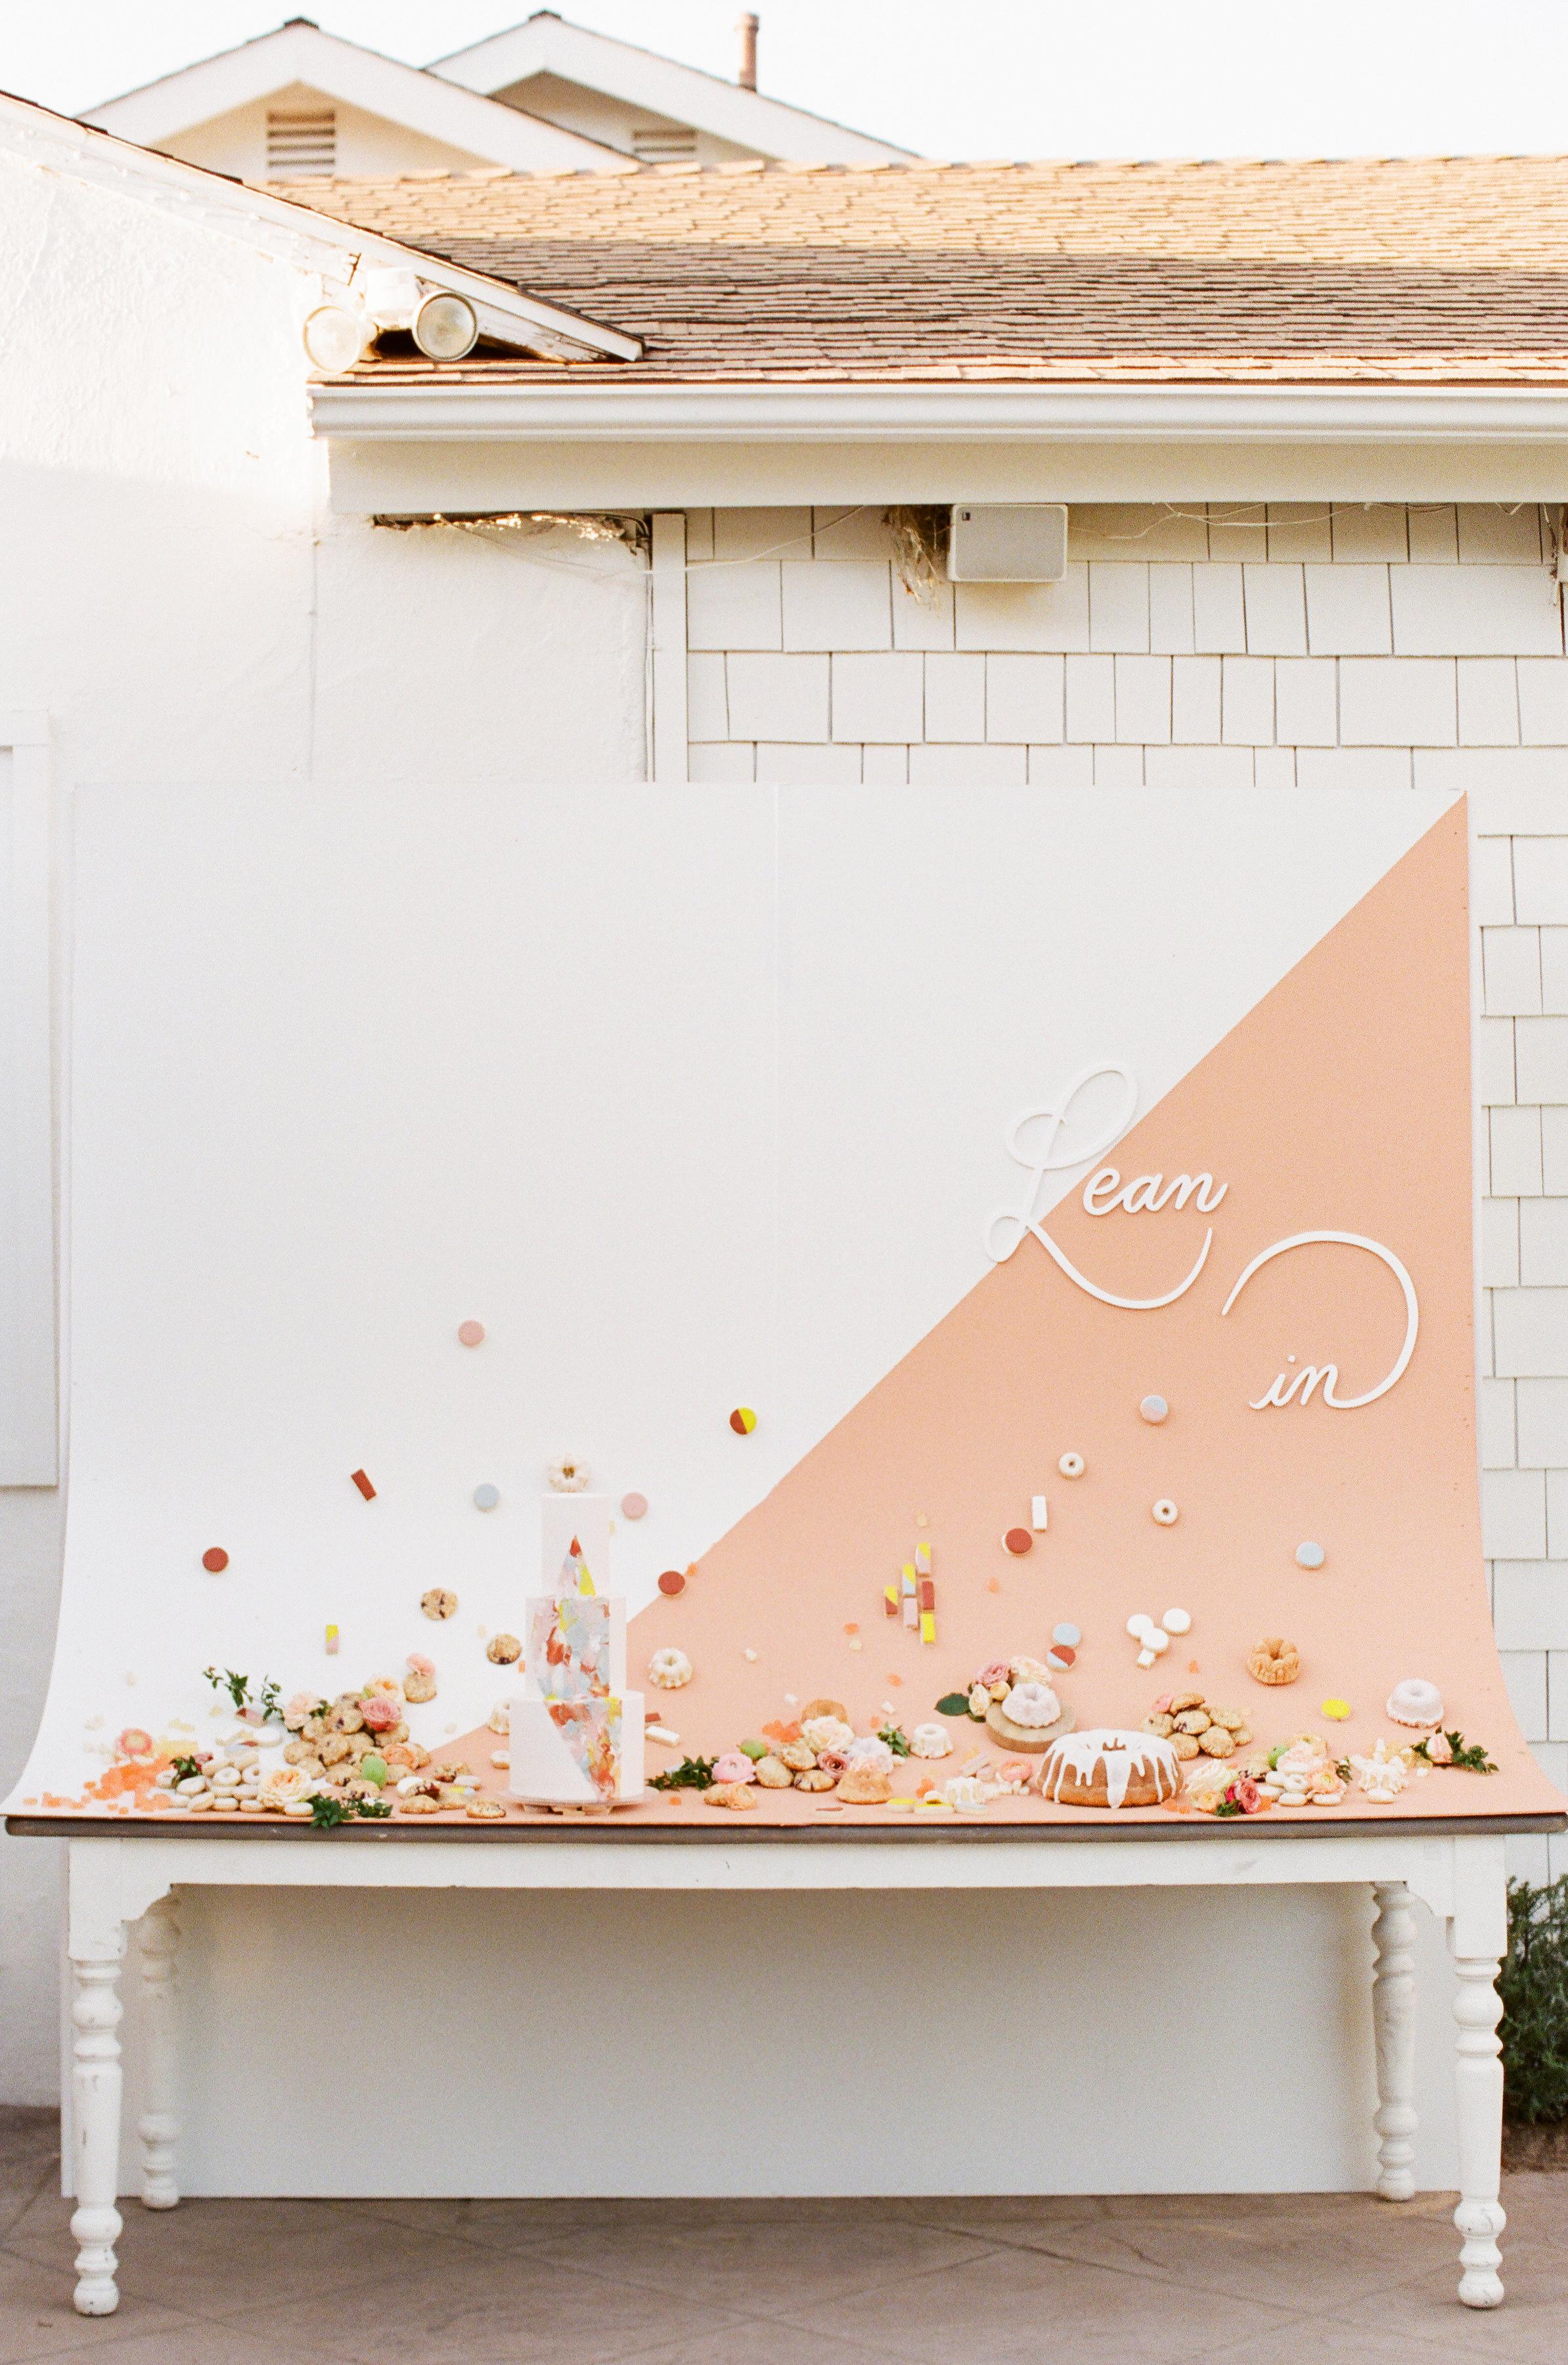 Tenley molzahn taylor leopold wedding desserts